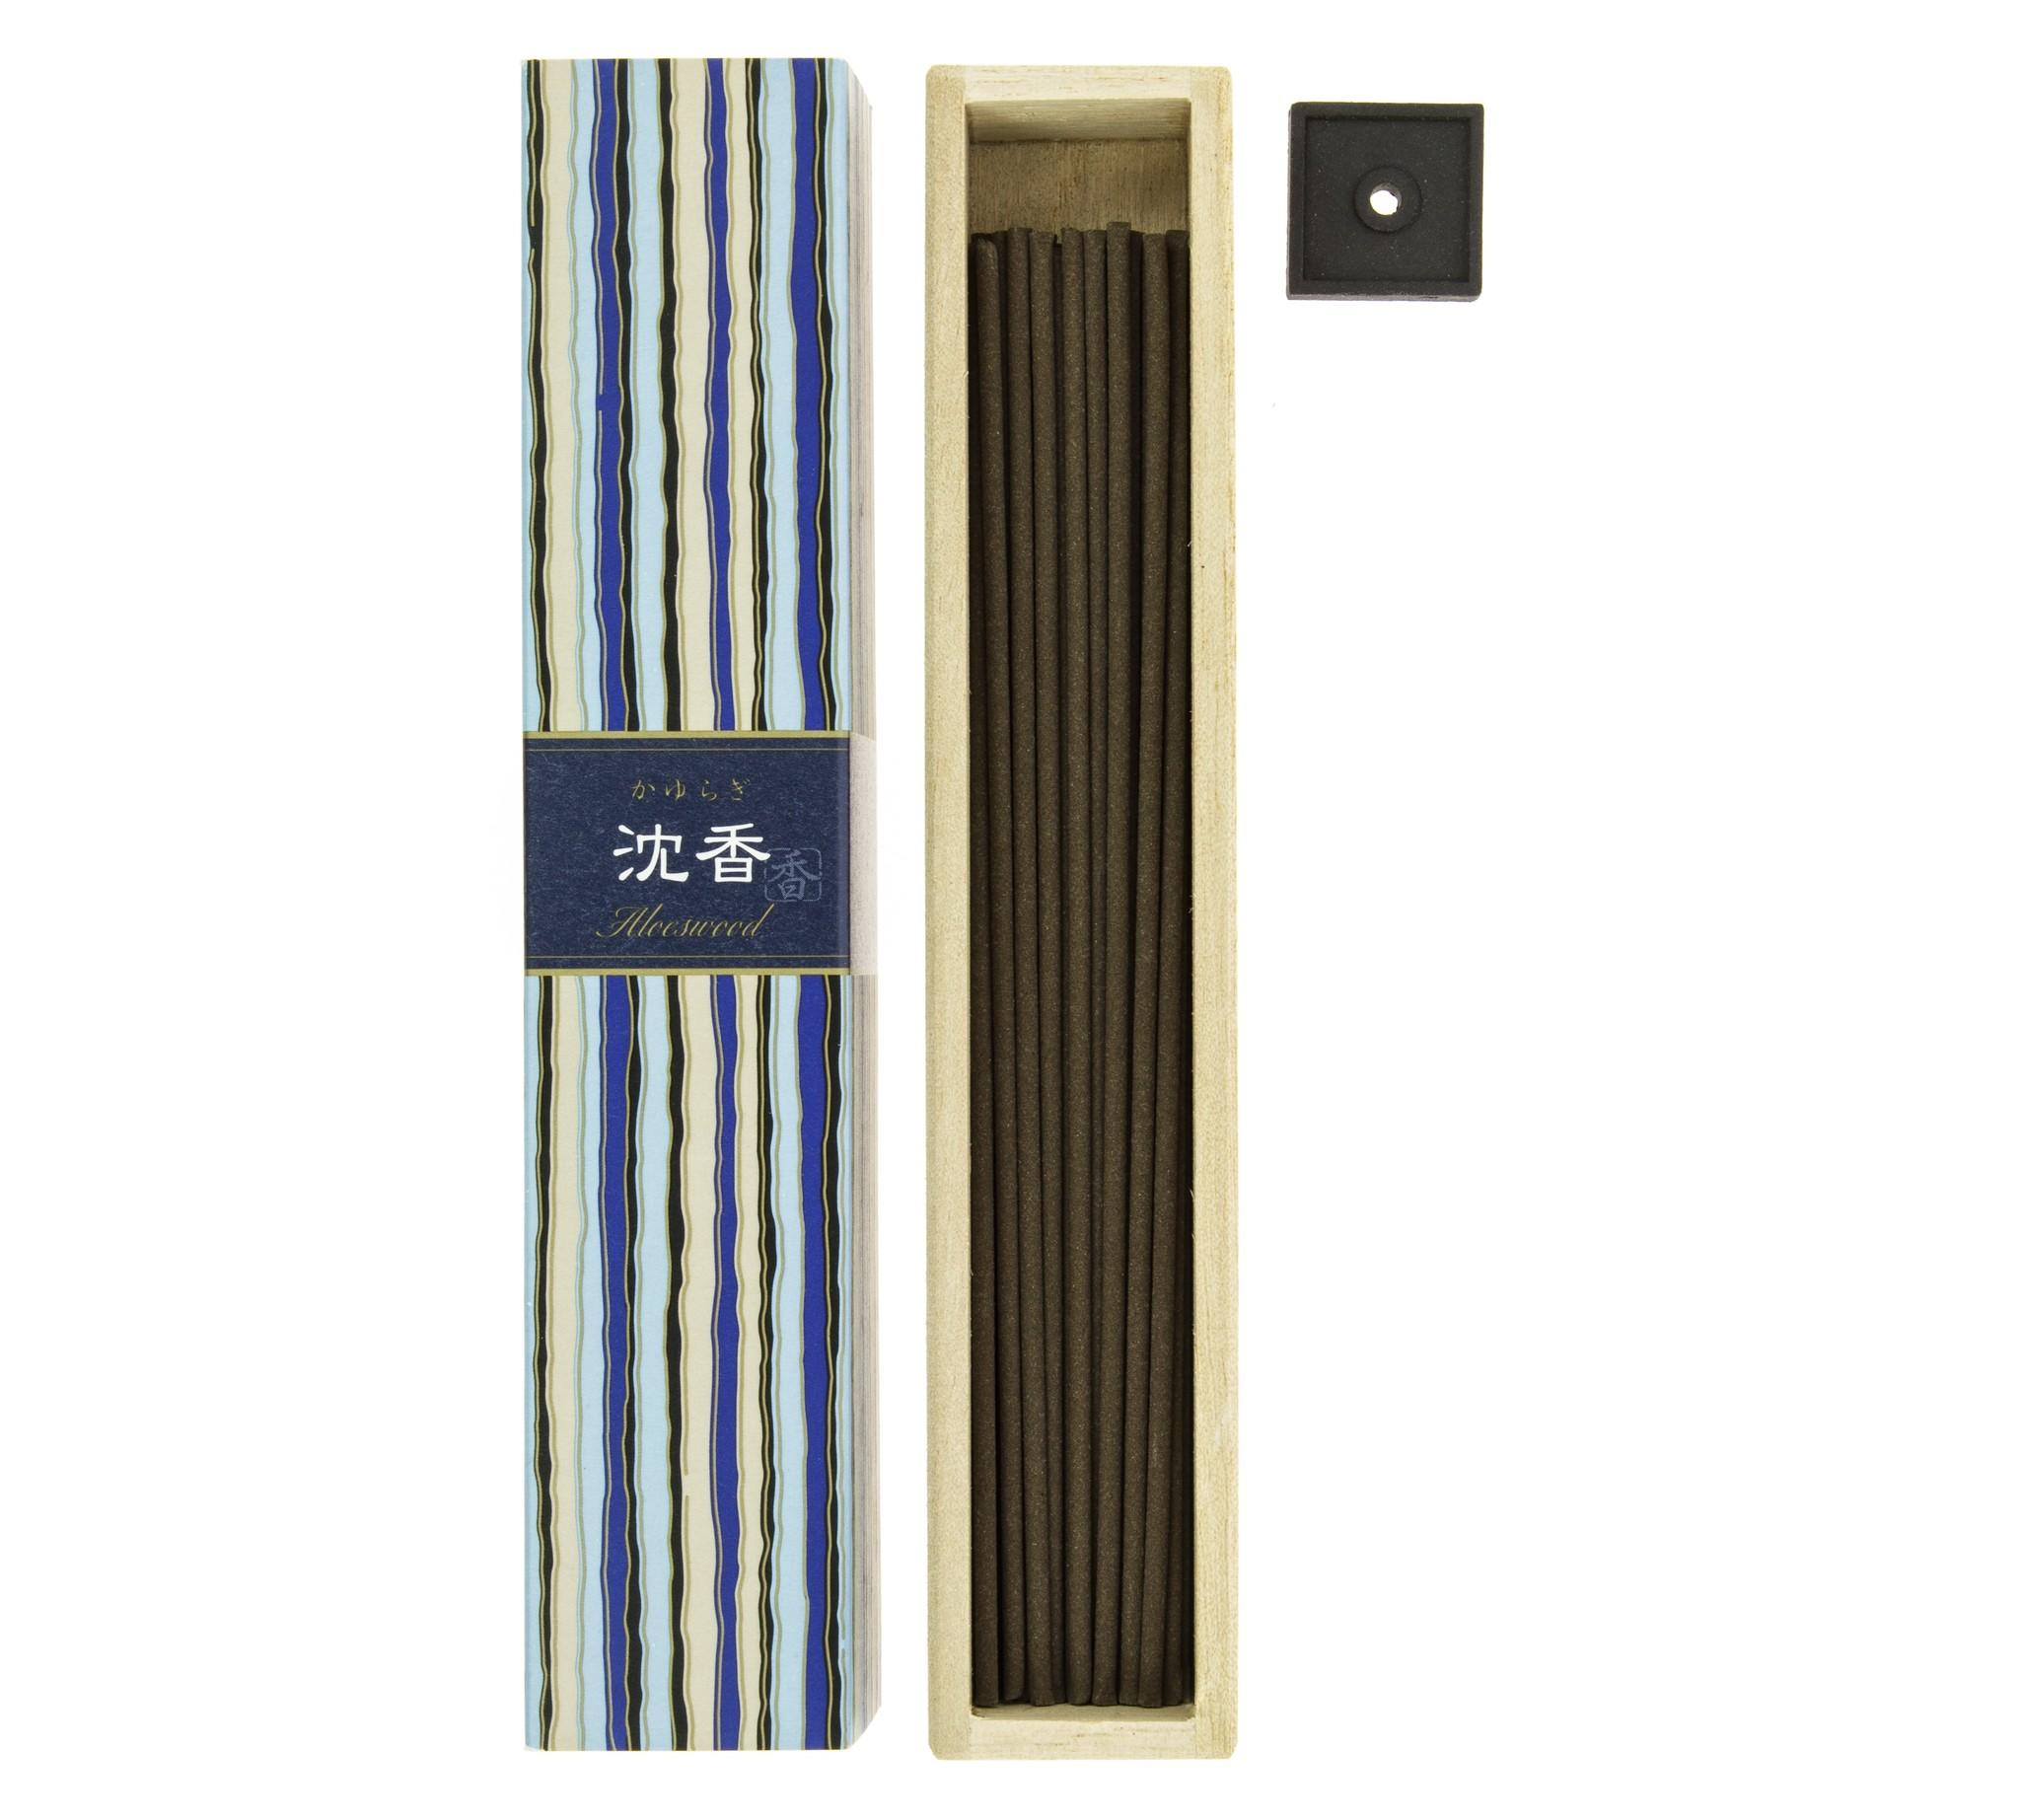 Kayuragi Aloewood Incense-1